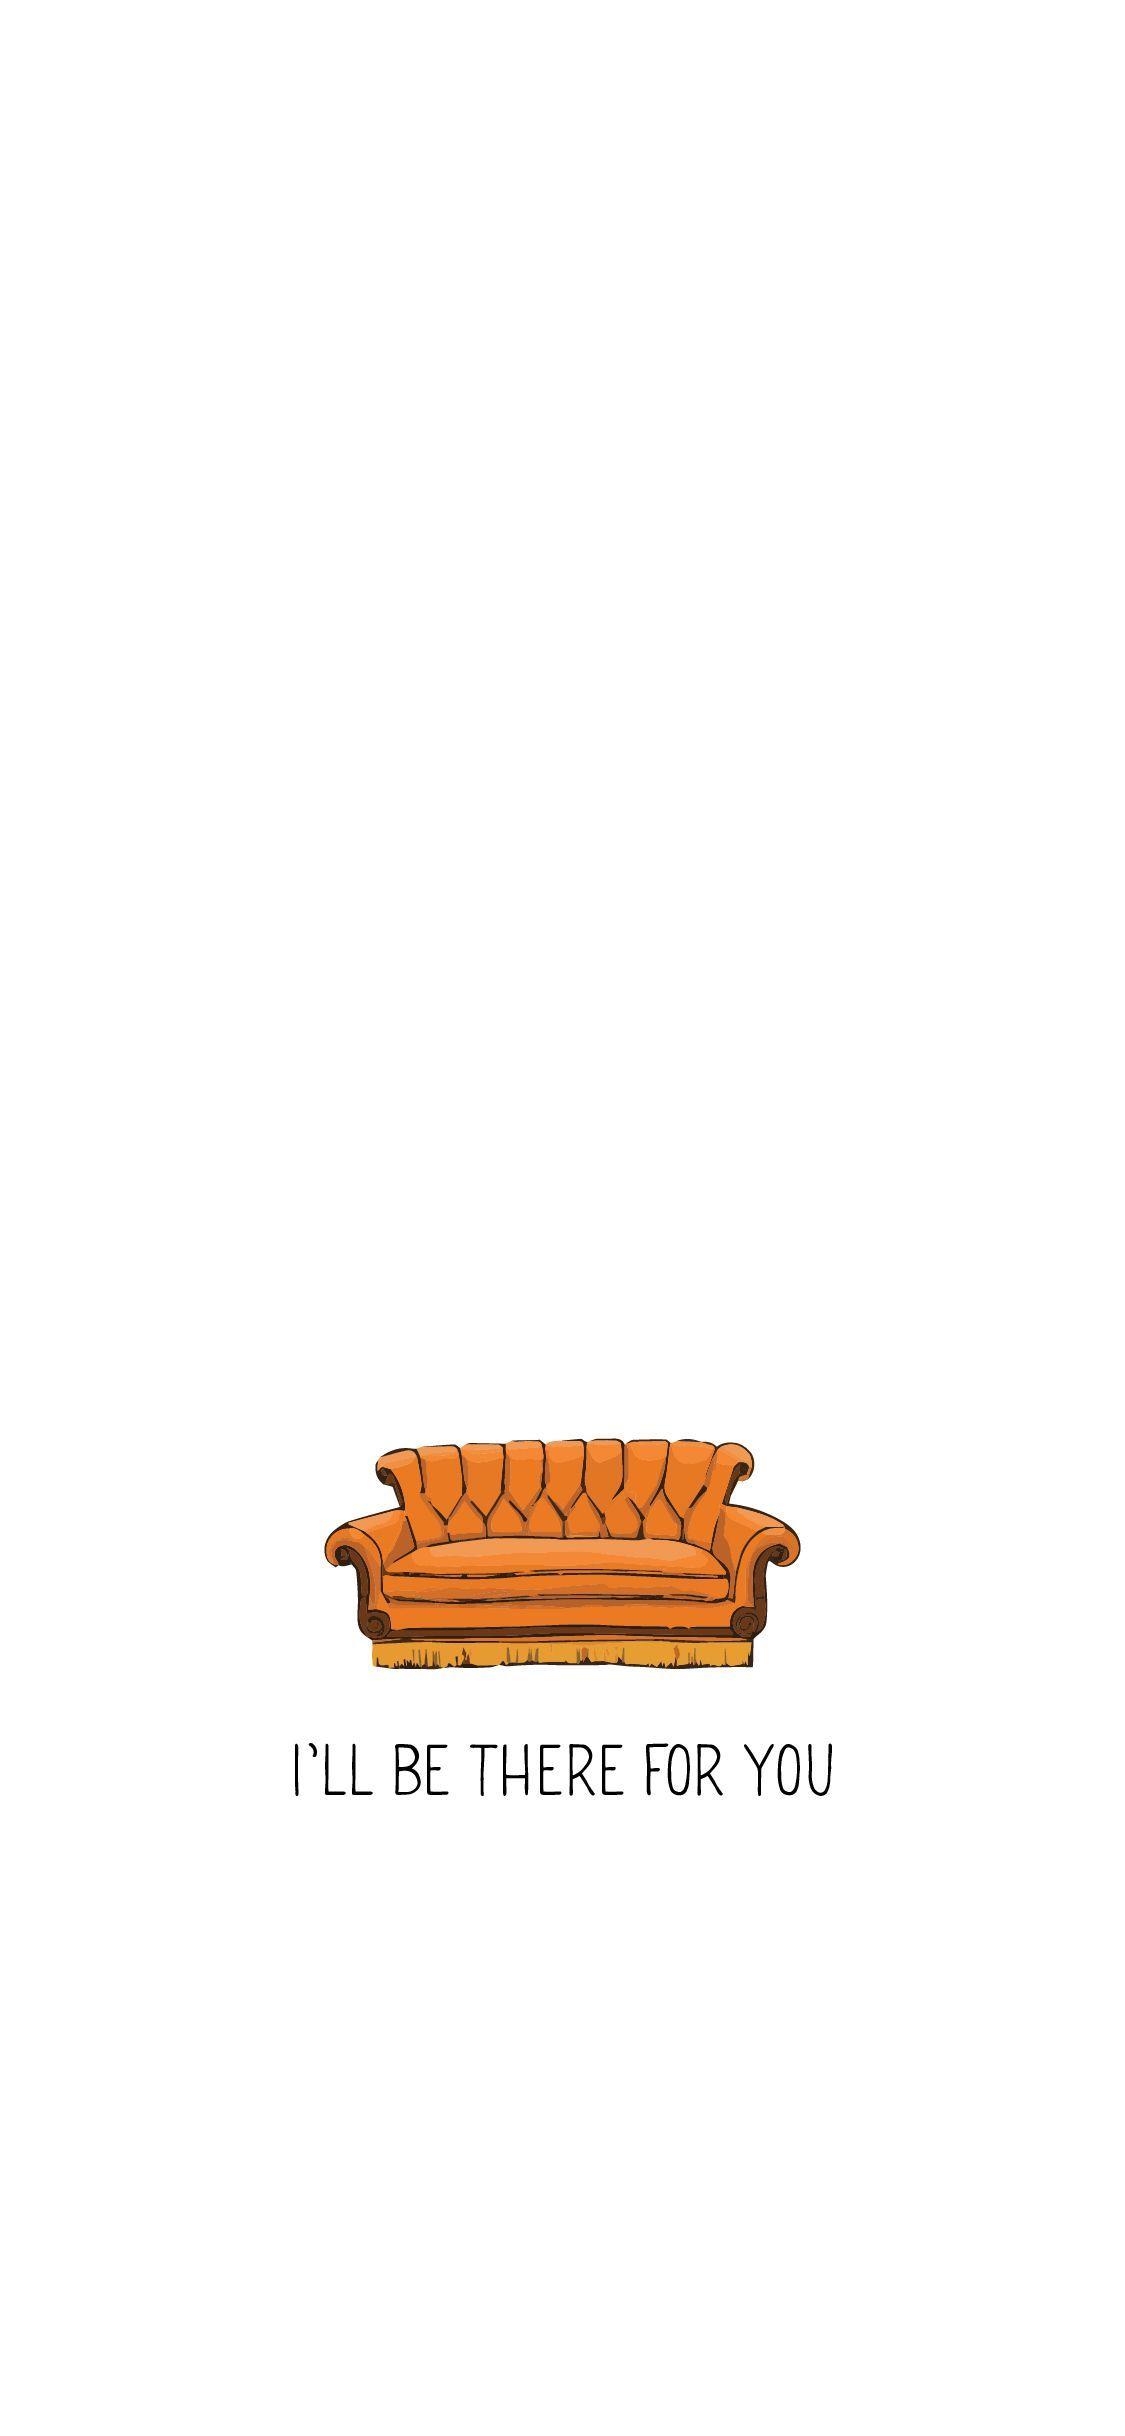 Roliga Vanner Tv Show Iphone Bakgrunds In 2020 Funny Phone Wallpaper Best Friend Wallpaper Friends Wallpaper